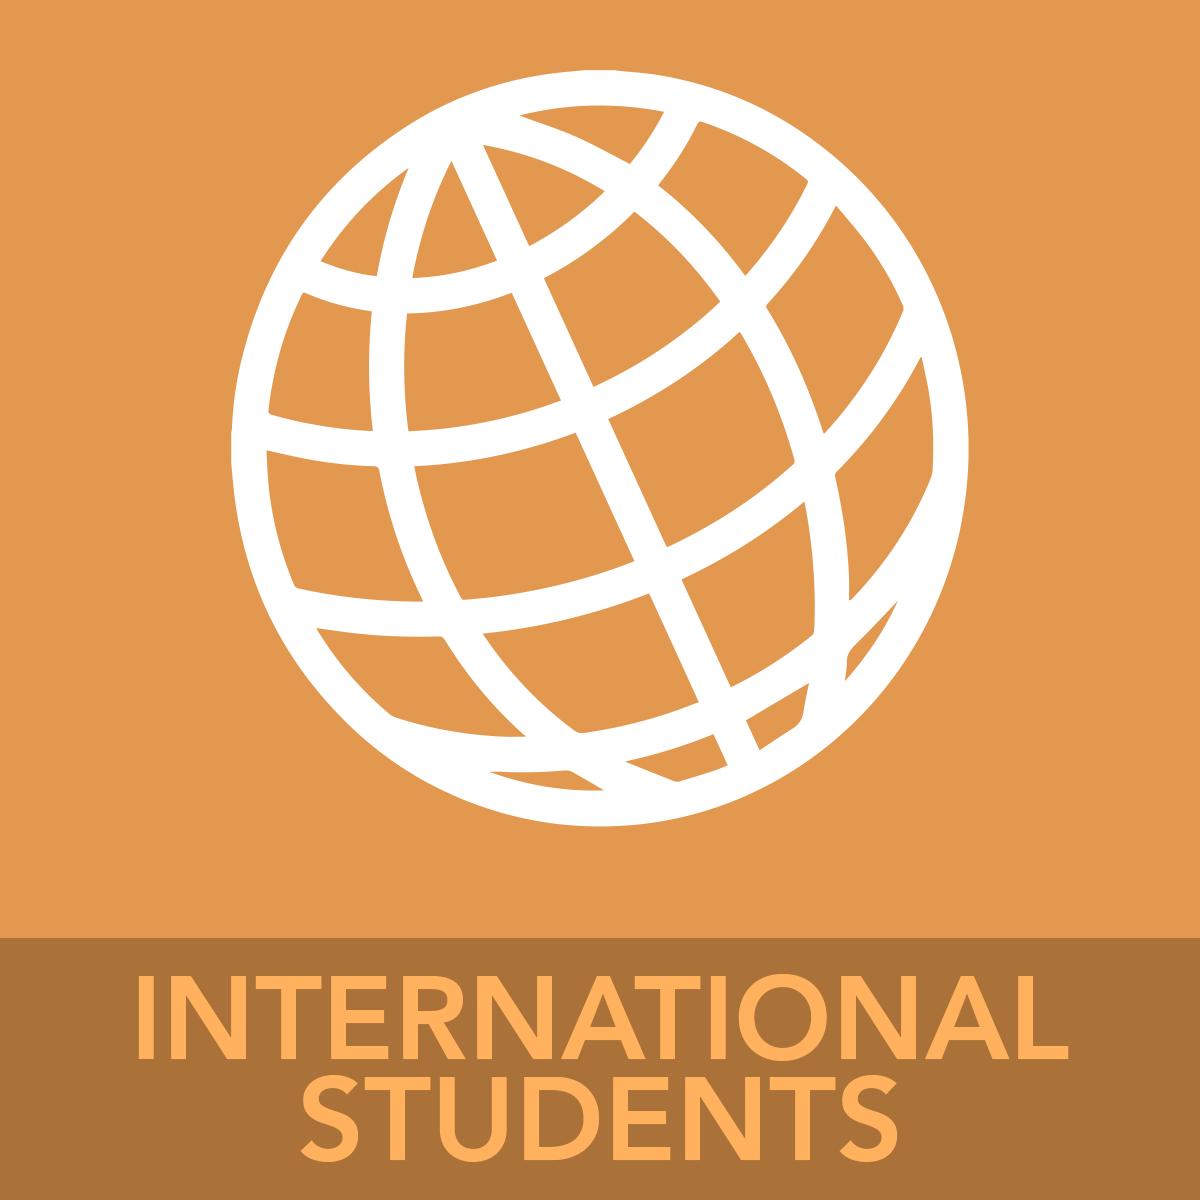 INTERNATIONAL STUDENTS ICON BUTTON